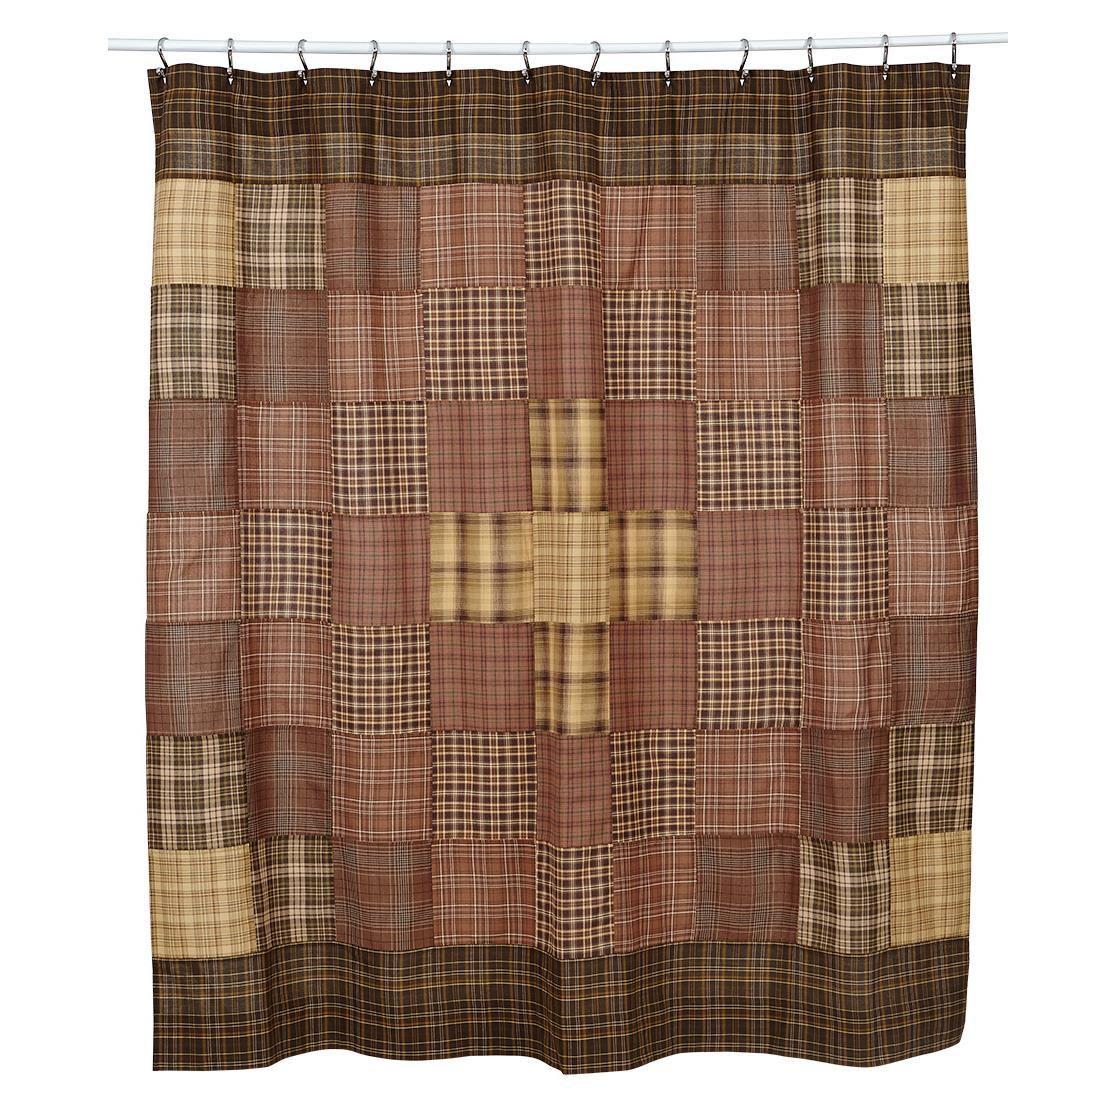 Prescott Shower Curtain - Country Village Shoppe